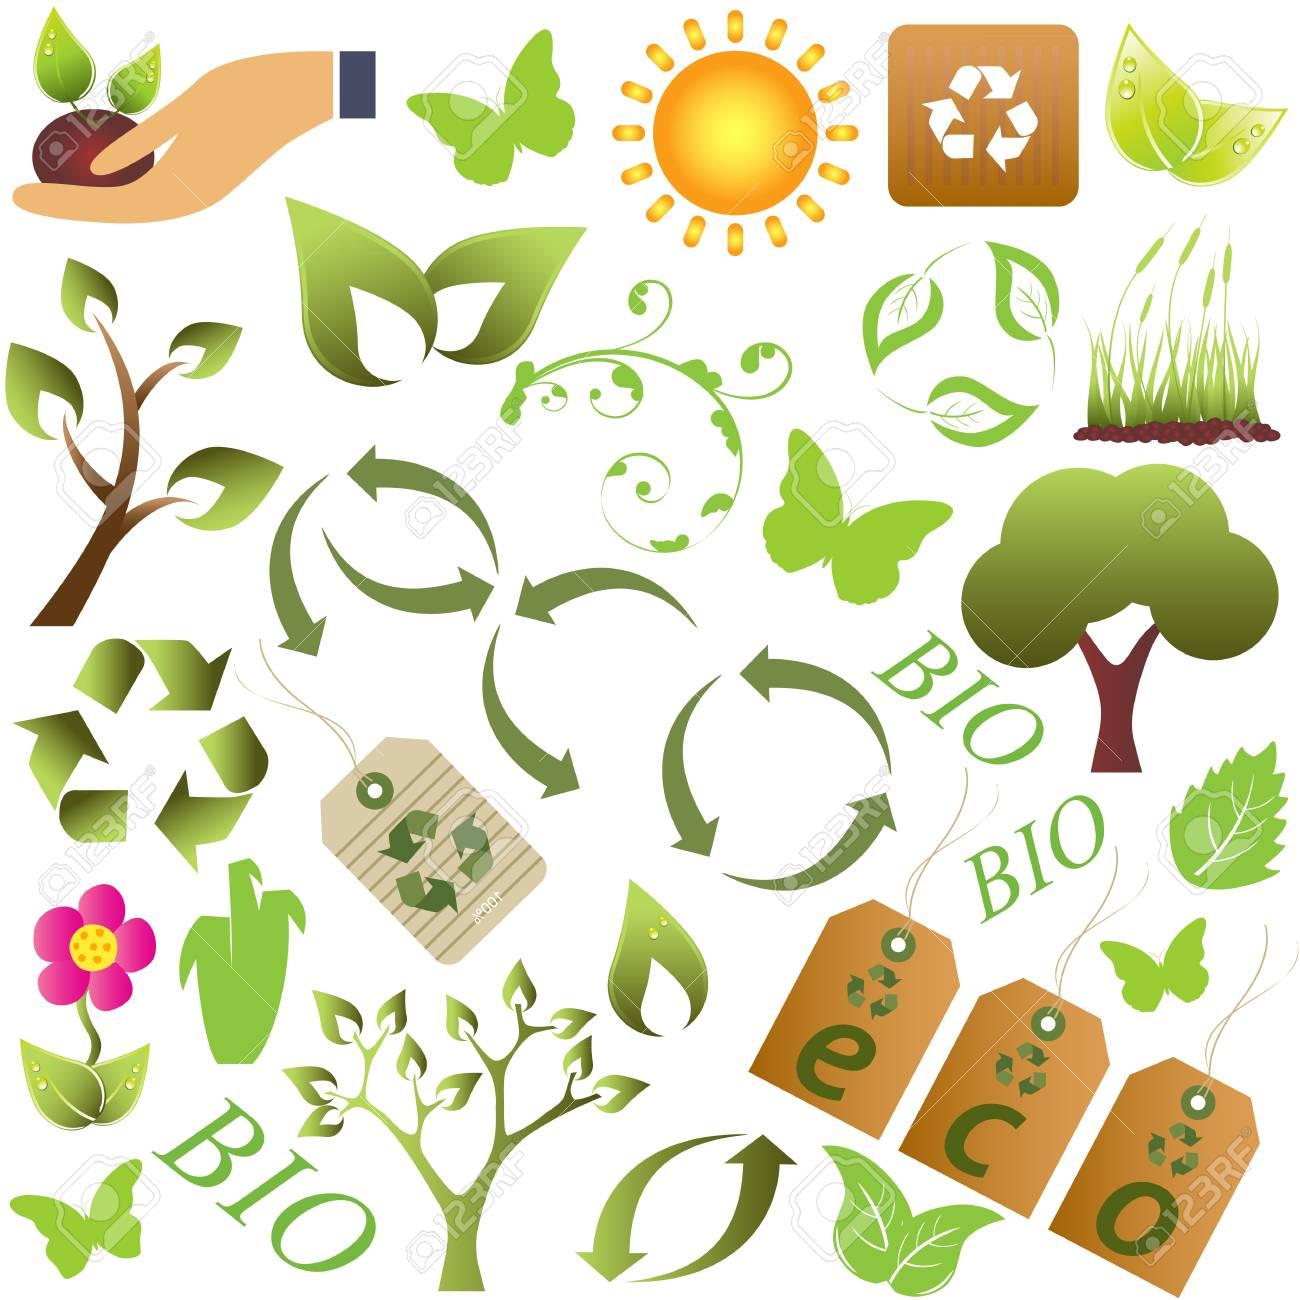 Eco and environment friendly symbols Stock Vector - 9400223